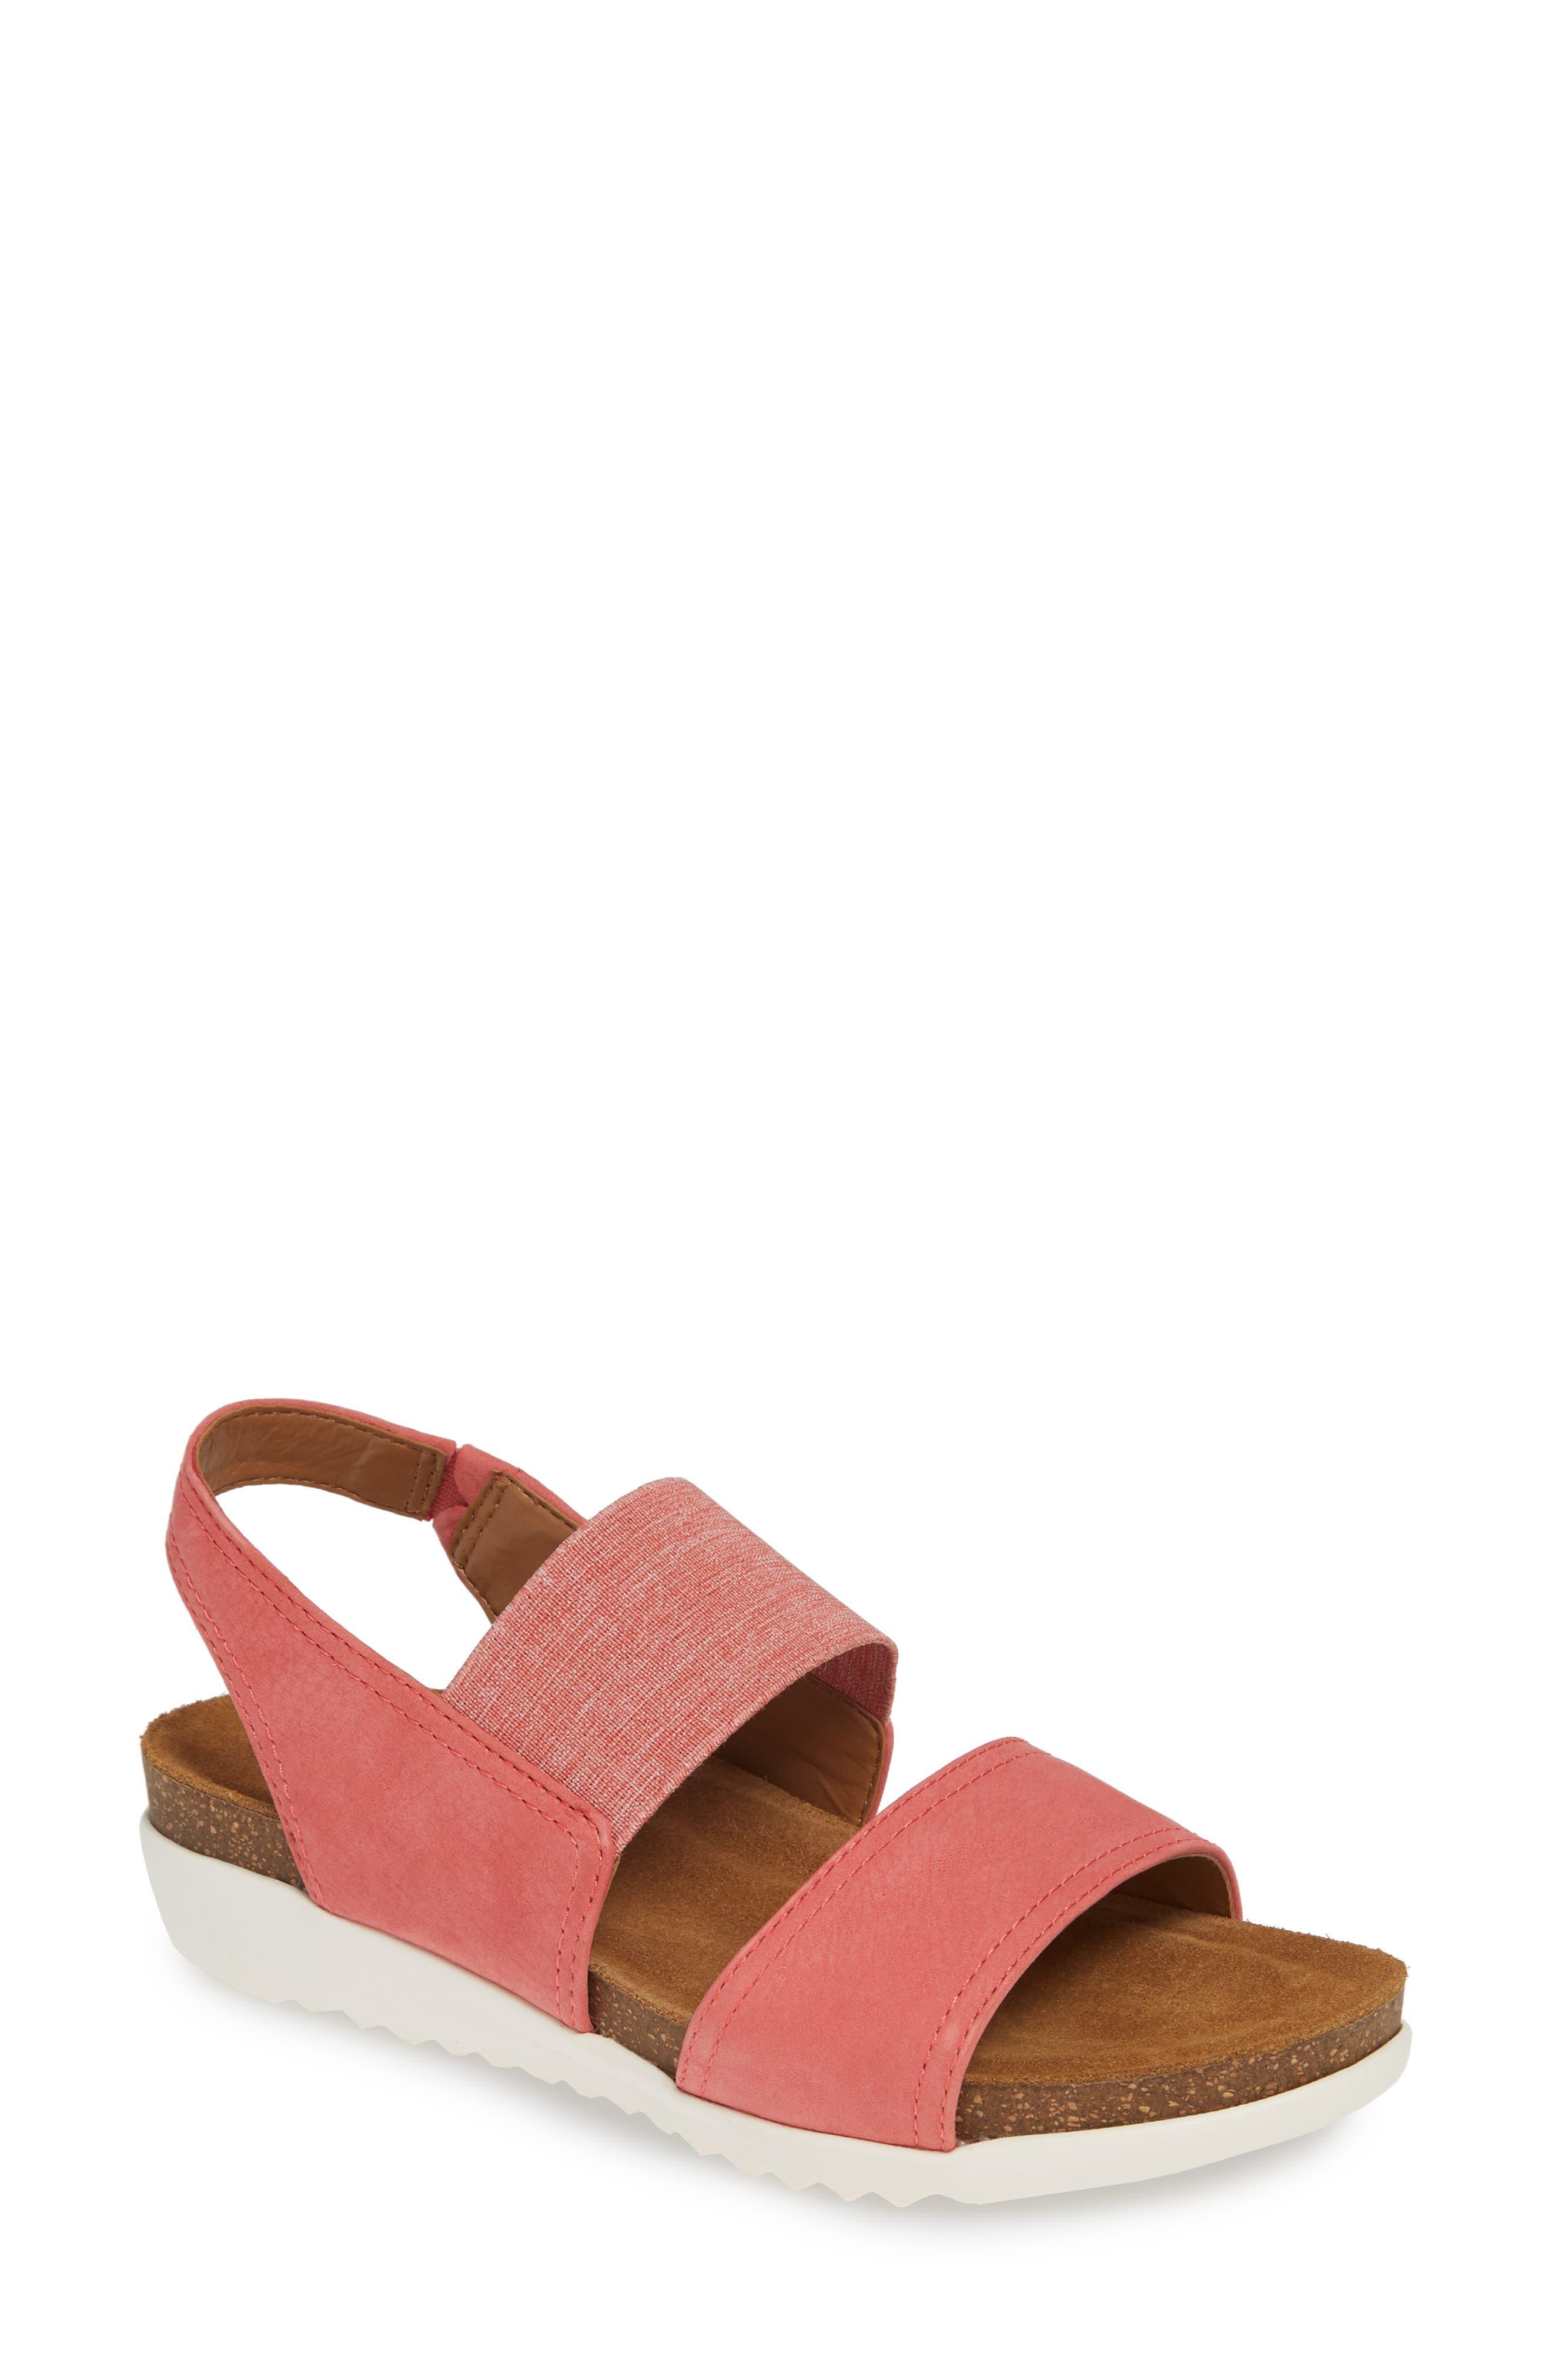 Comfortiva Elicia Wedge Sandal, Pink